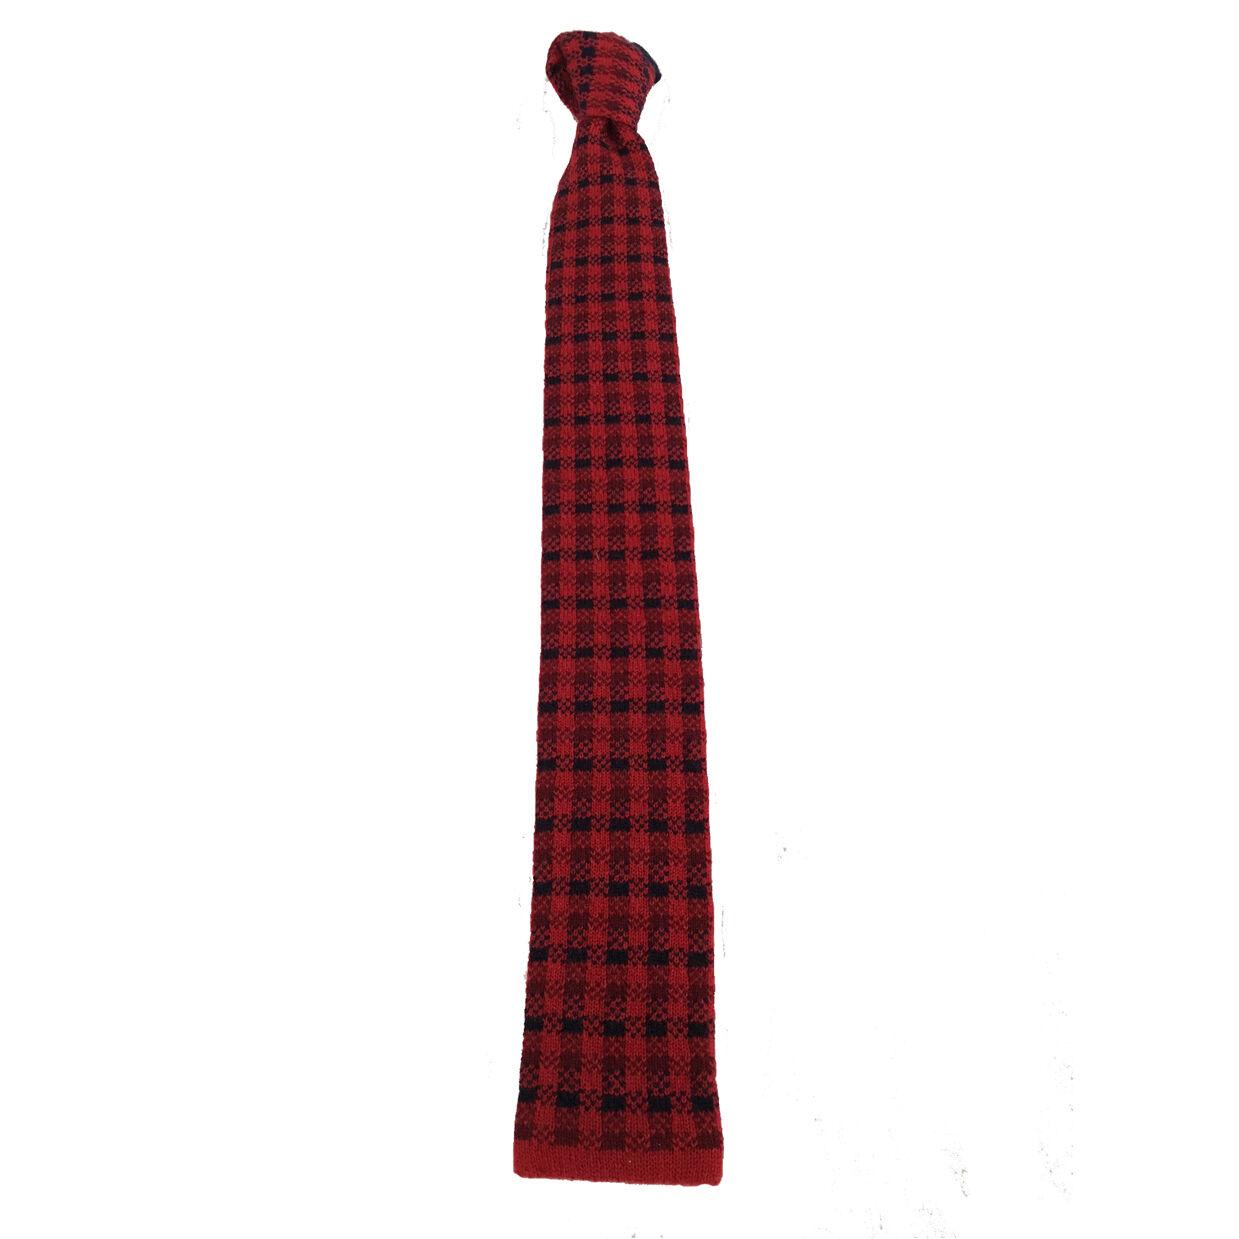 FIORIO Milano Krawatte Jersey Fuß de Poule rot 100 % Kaschmir made in italy   Outlet Store